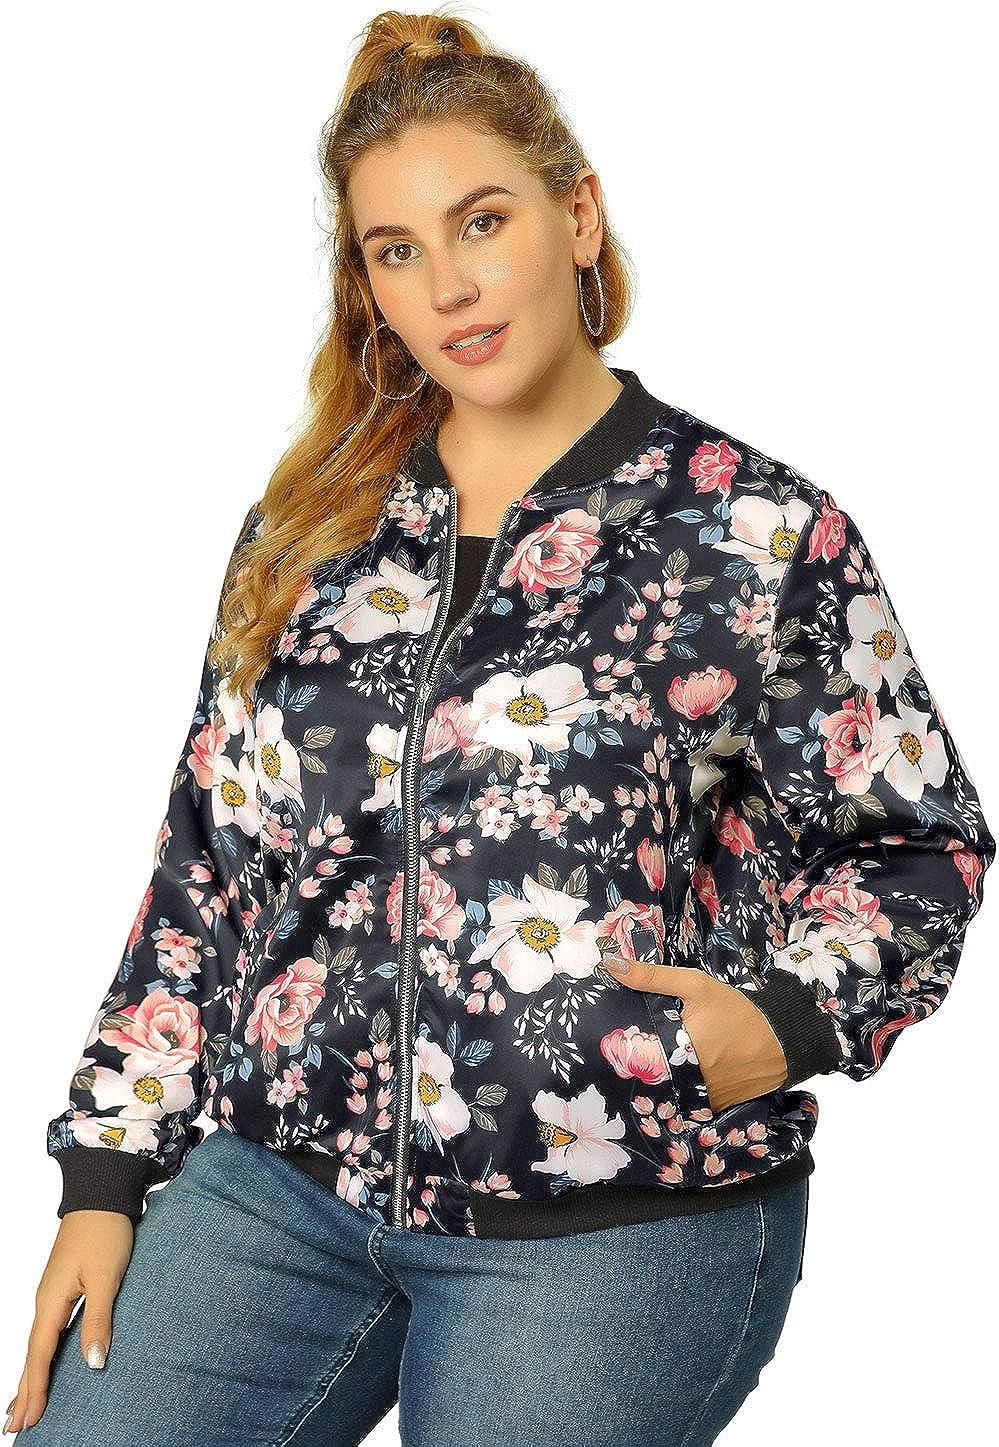 Agnes Orinda Women's Plus Size Bomber Jacket Zipper Long Sleeves Floral Jackets